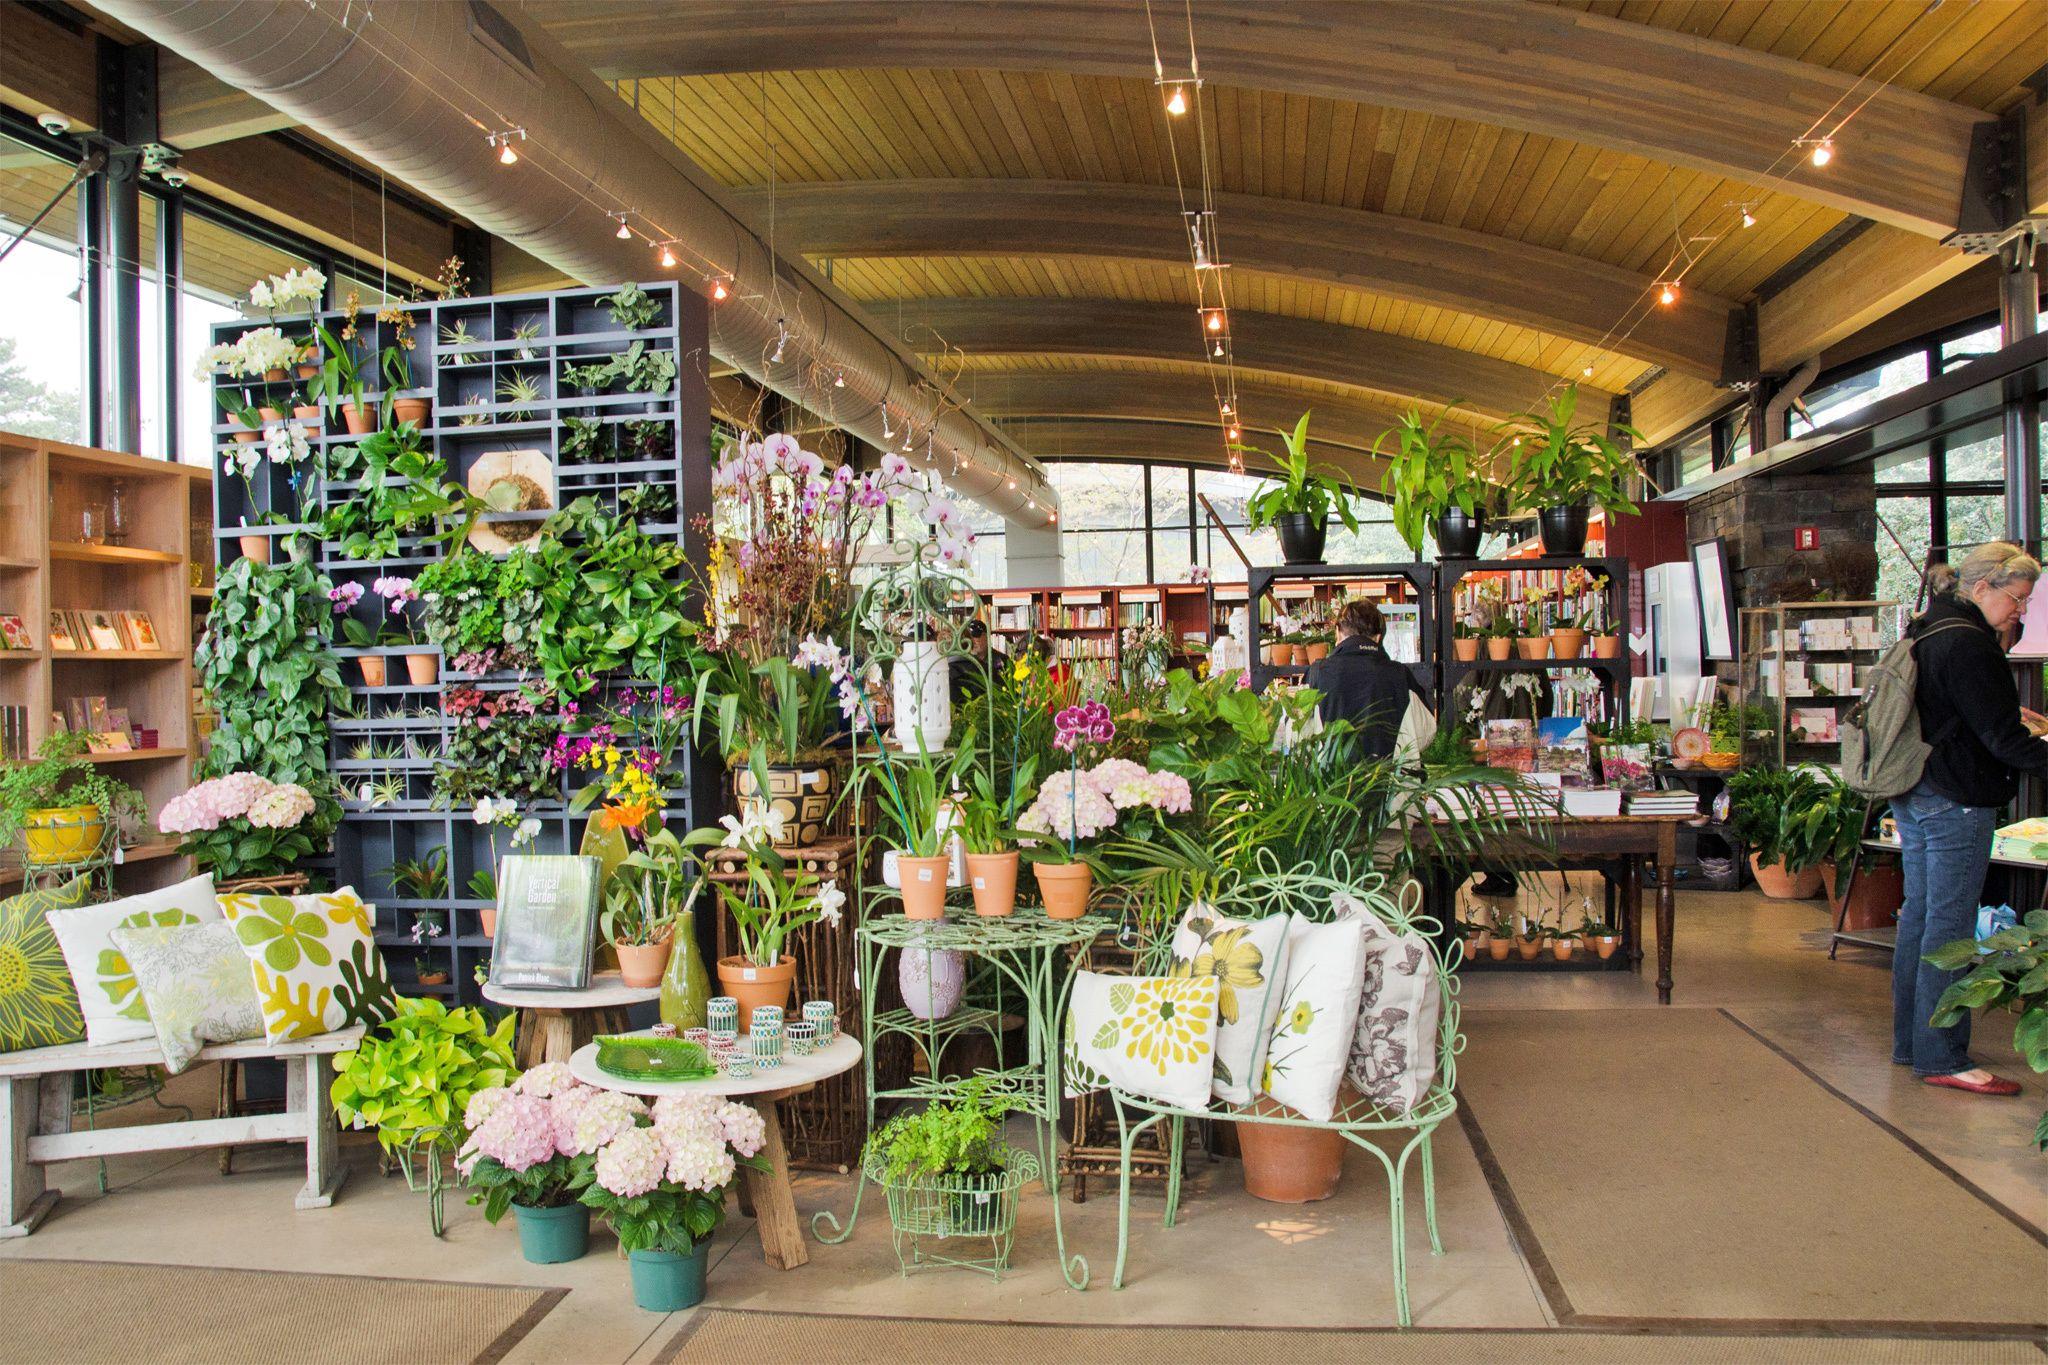 17 Best 1000 images about garden center on Pinterest Gardens The